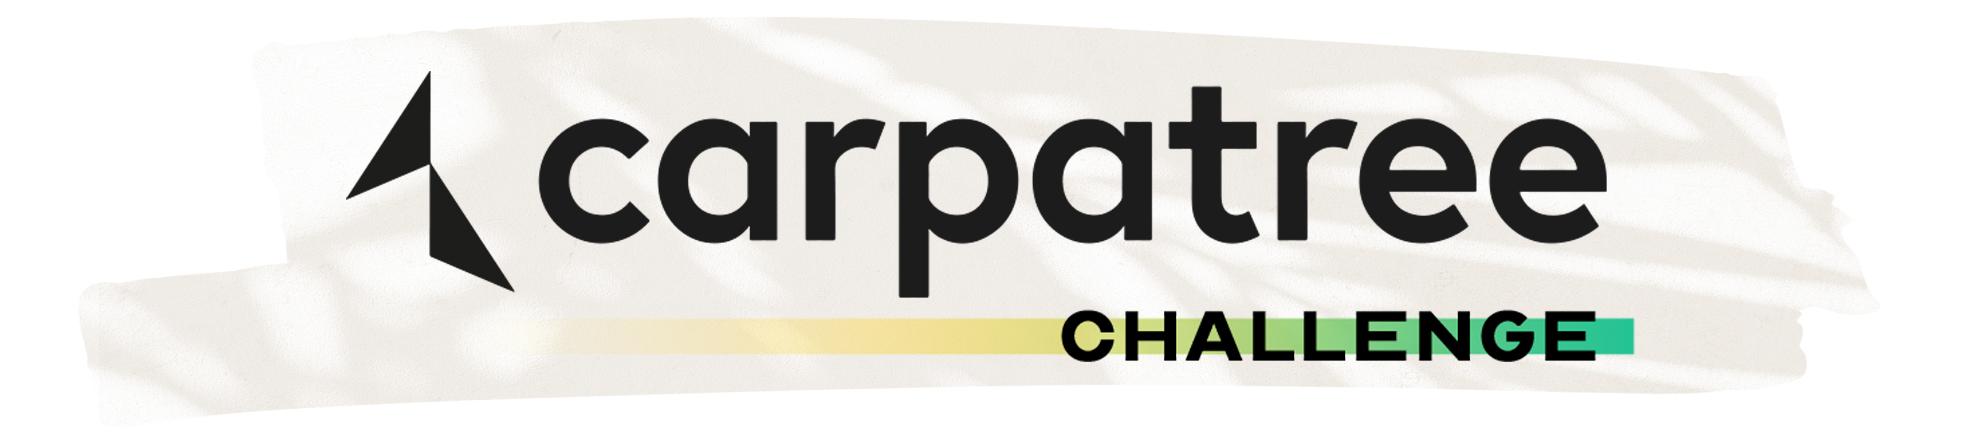 Carpatree Challenge Summer 2021